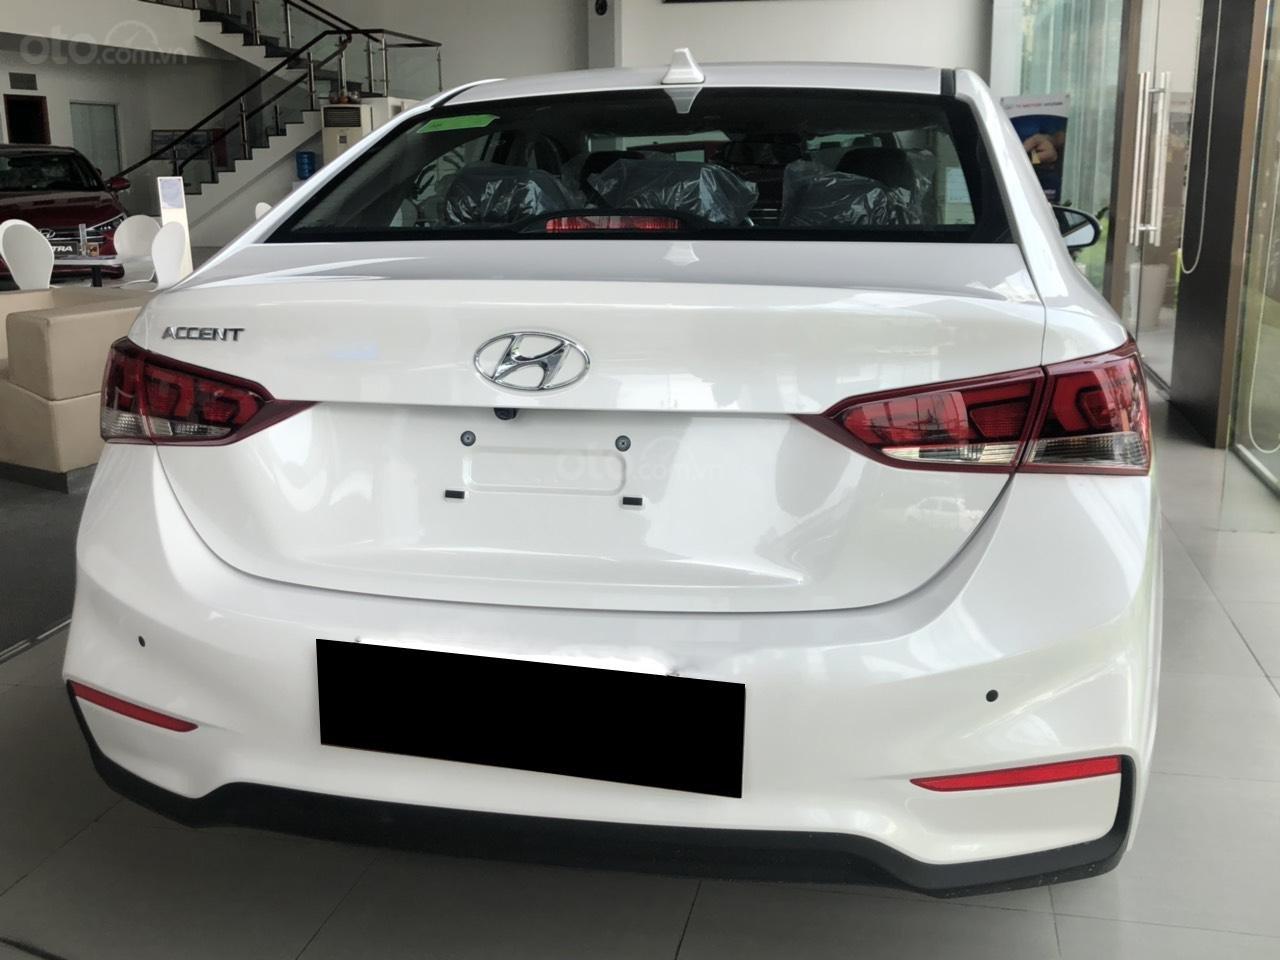 Bán Hyundai Accent 2019 - Giá tốt - xe sẵn - Bank bao đậu (1)